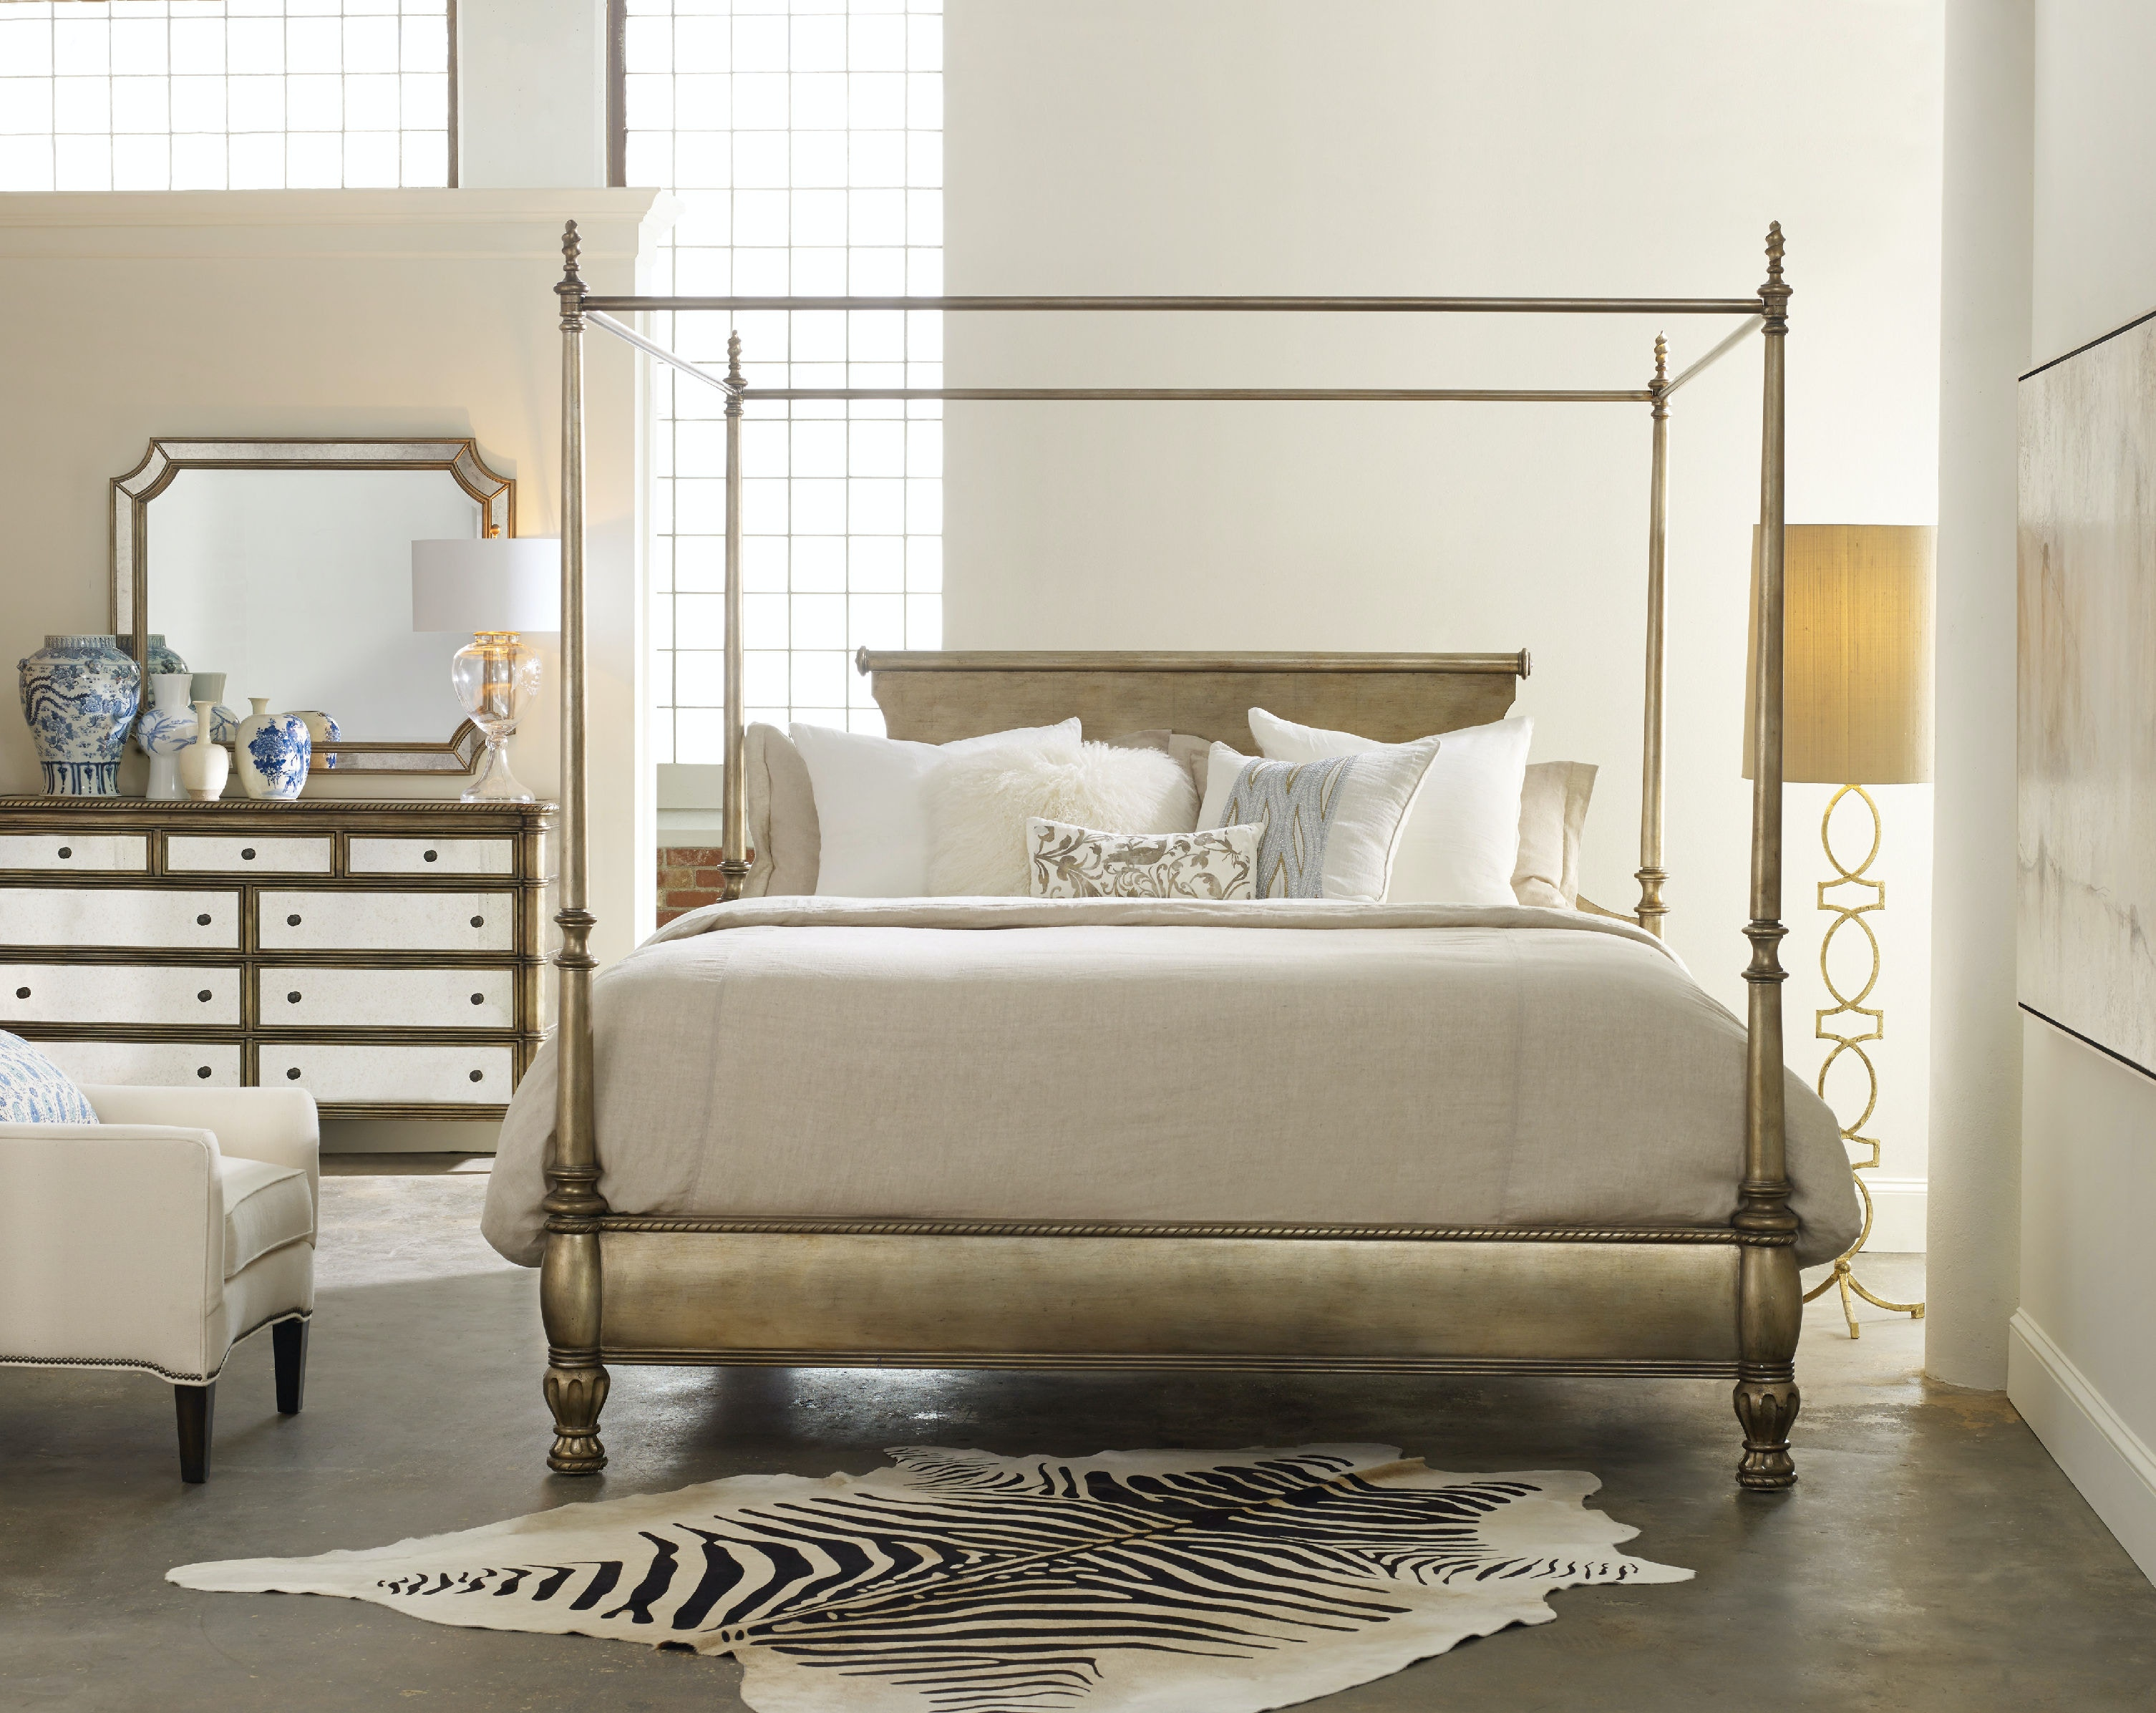 Hooker Furniture Bedroom Montage King Canopy 638 90970 Gorman S